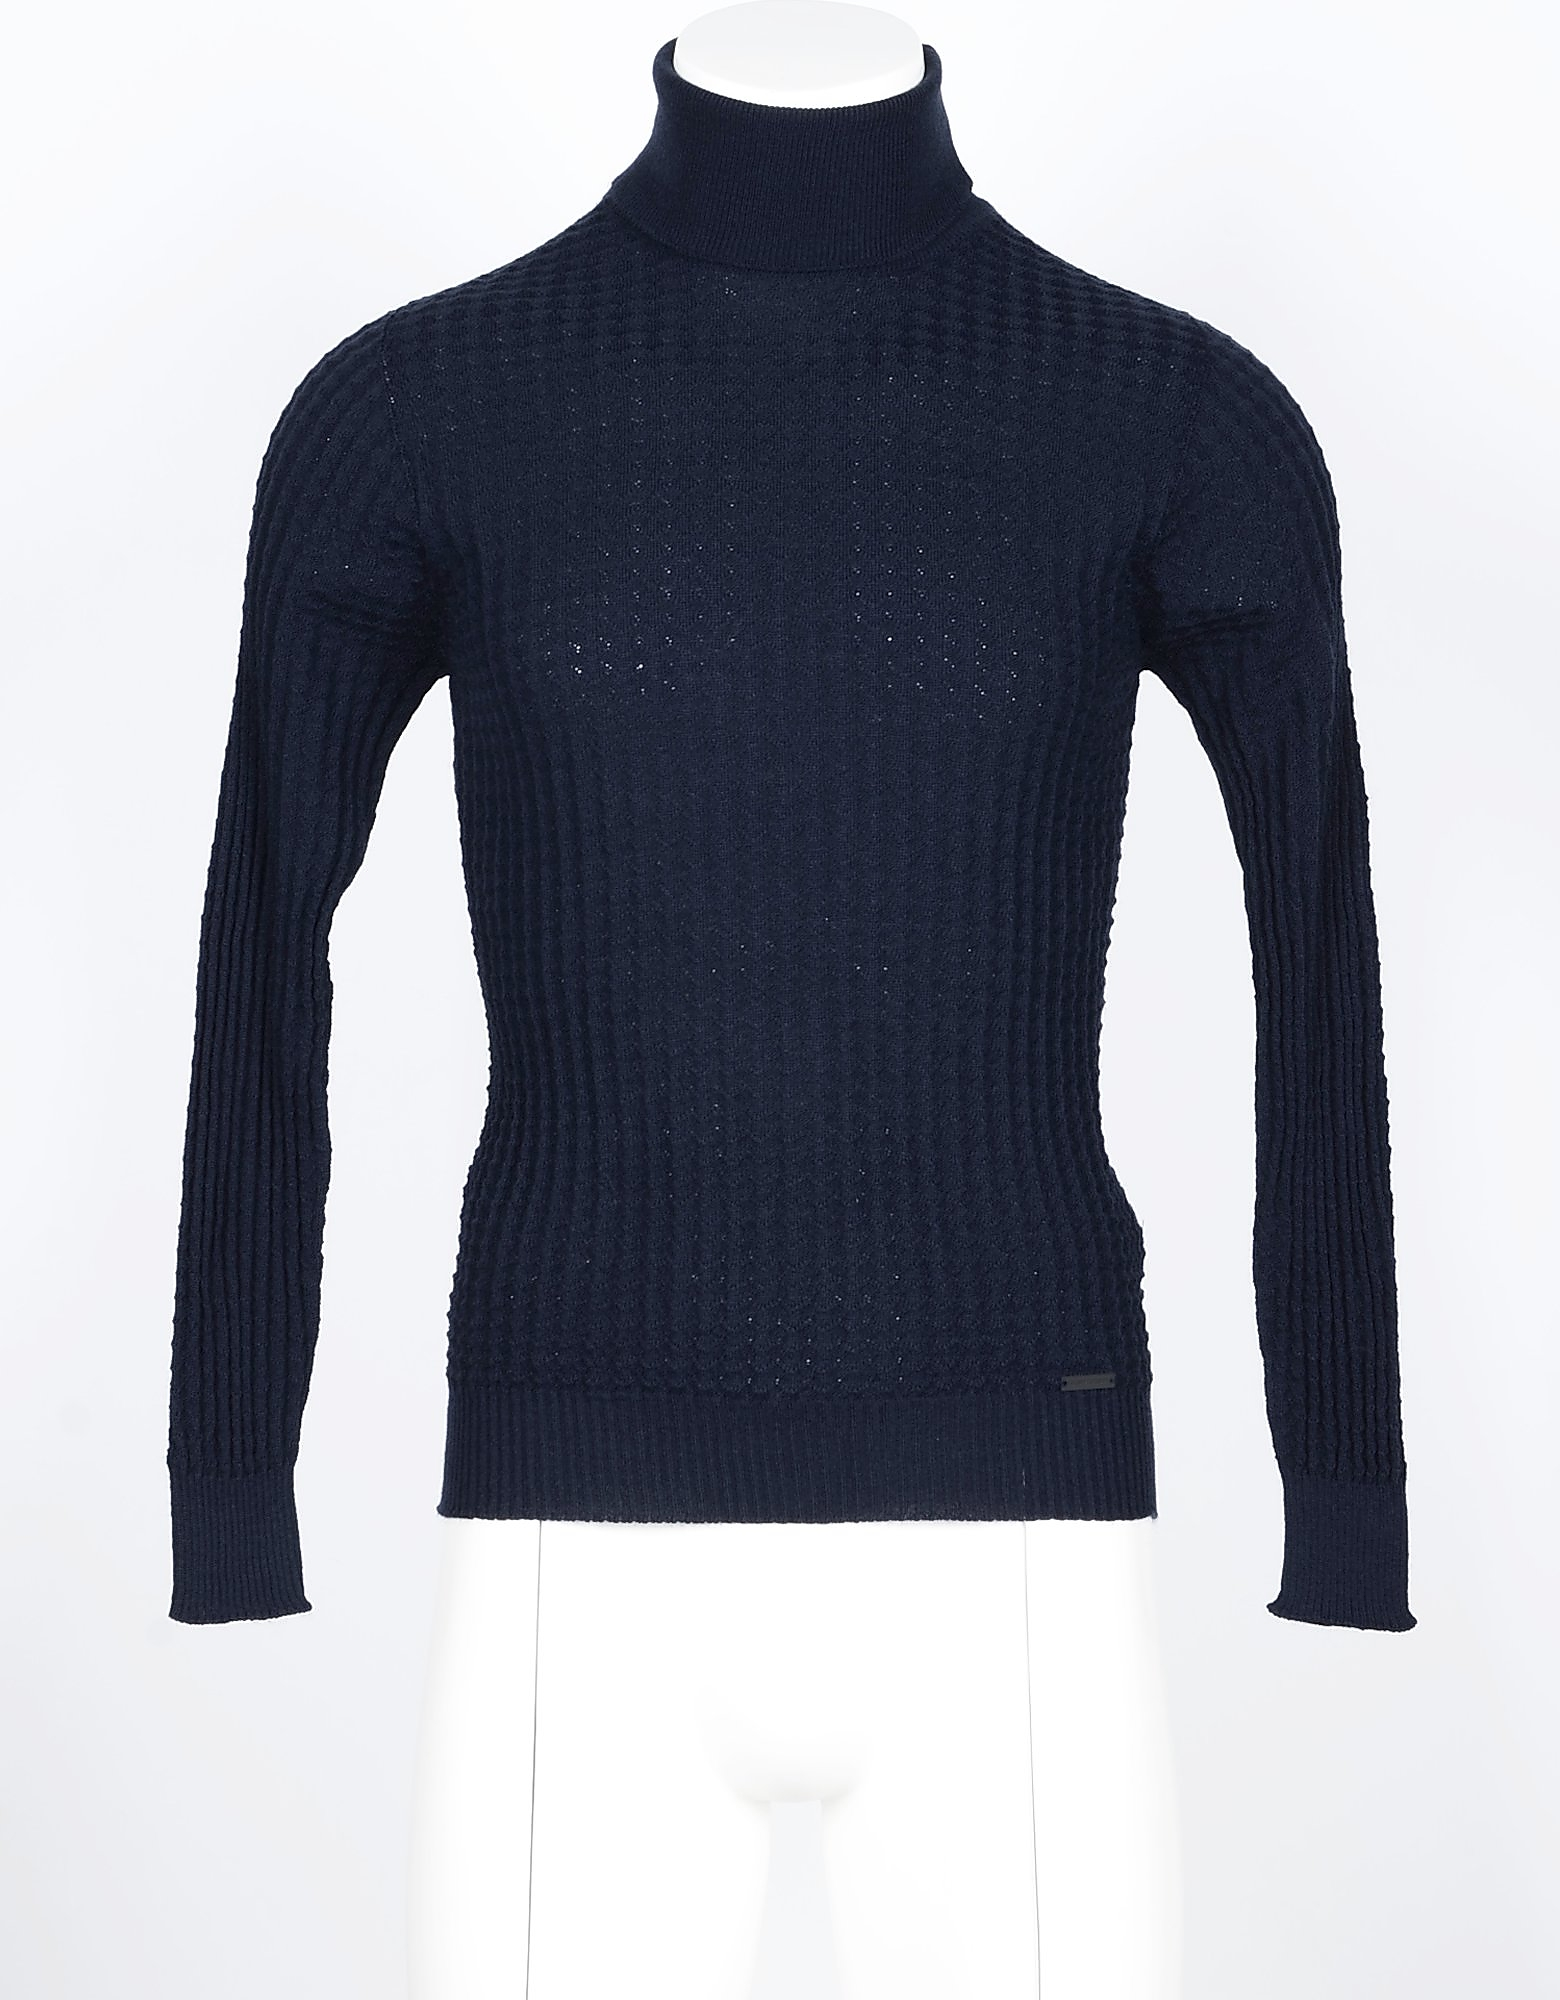 Takeshy Kurosawa Designer Knitwear, Blue Men's Turtleneck Sweater